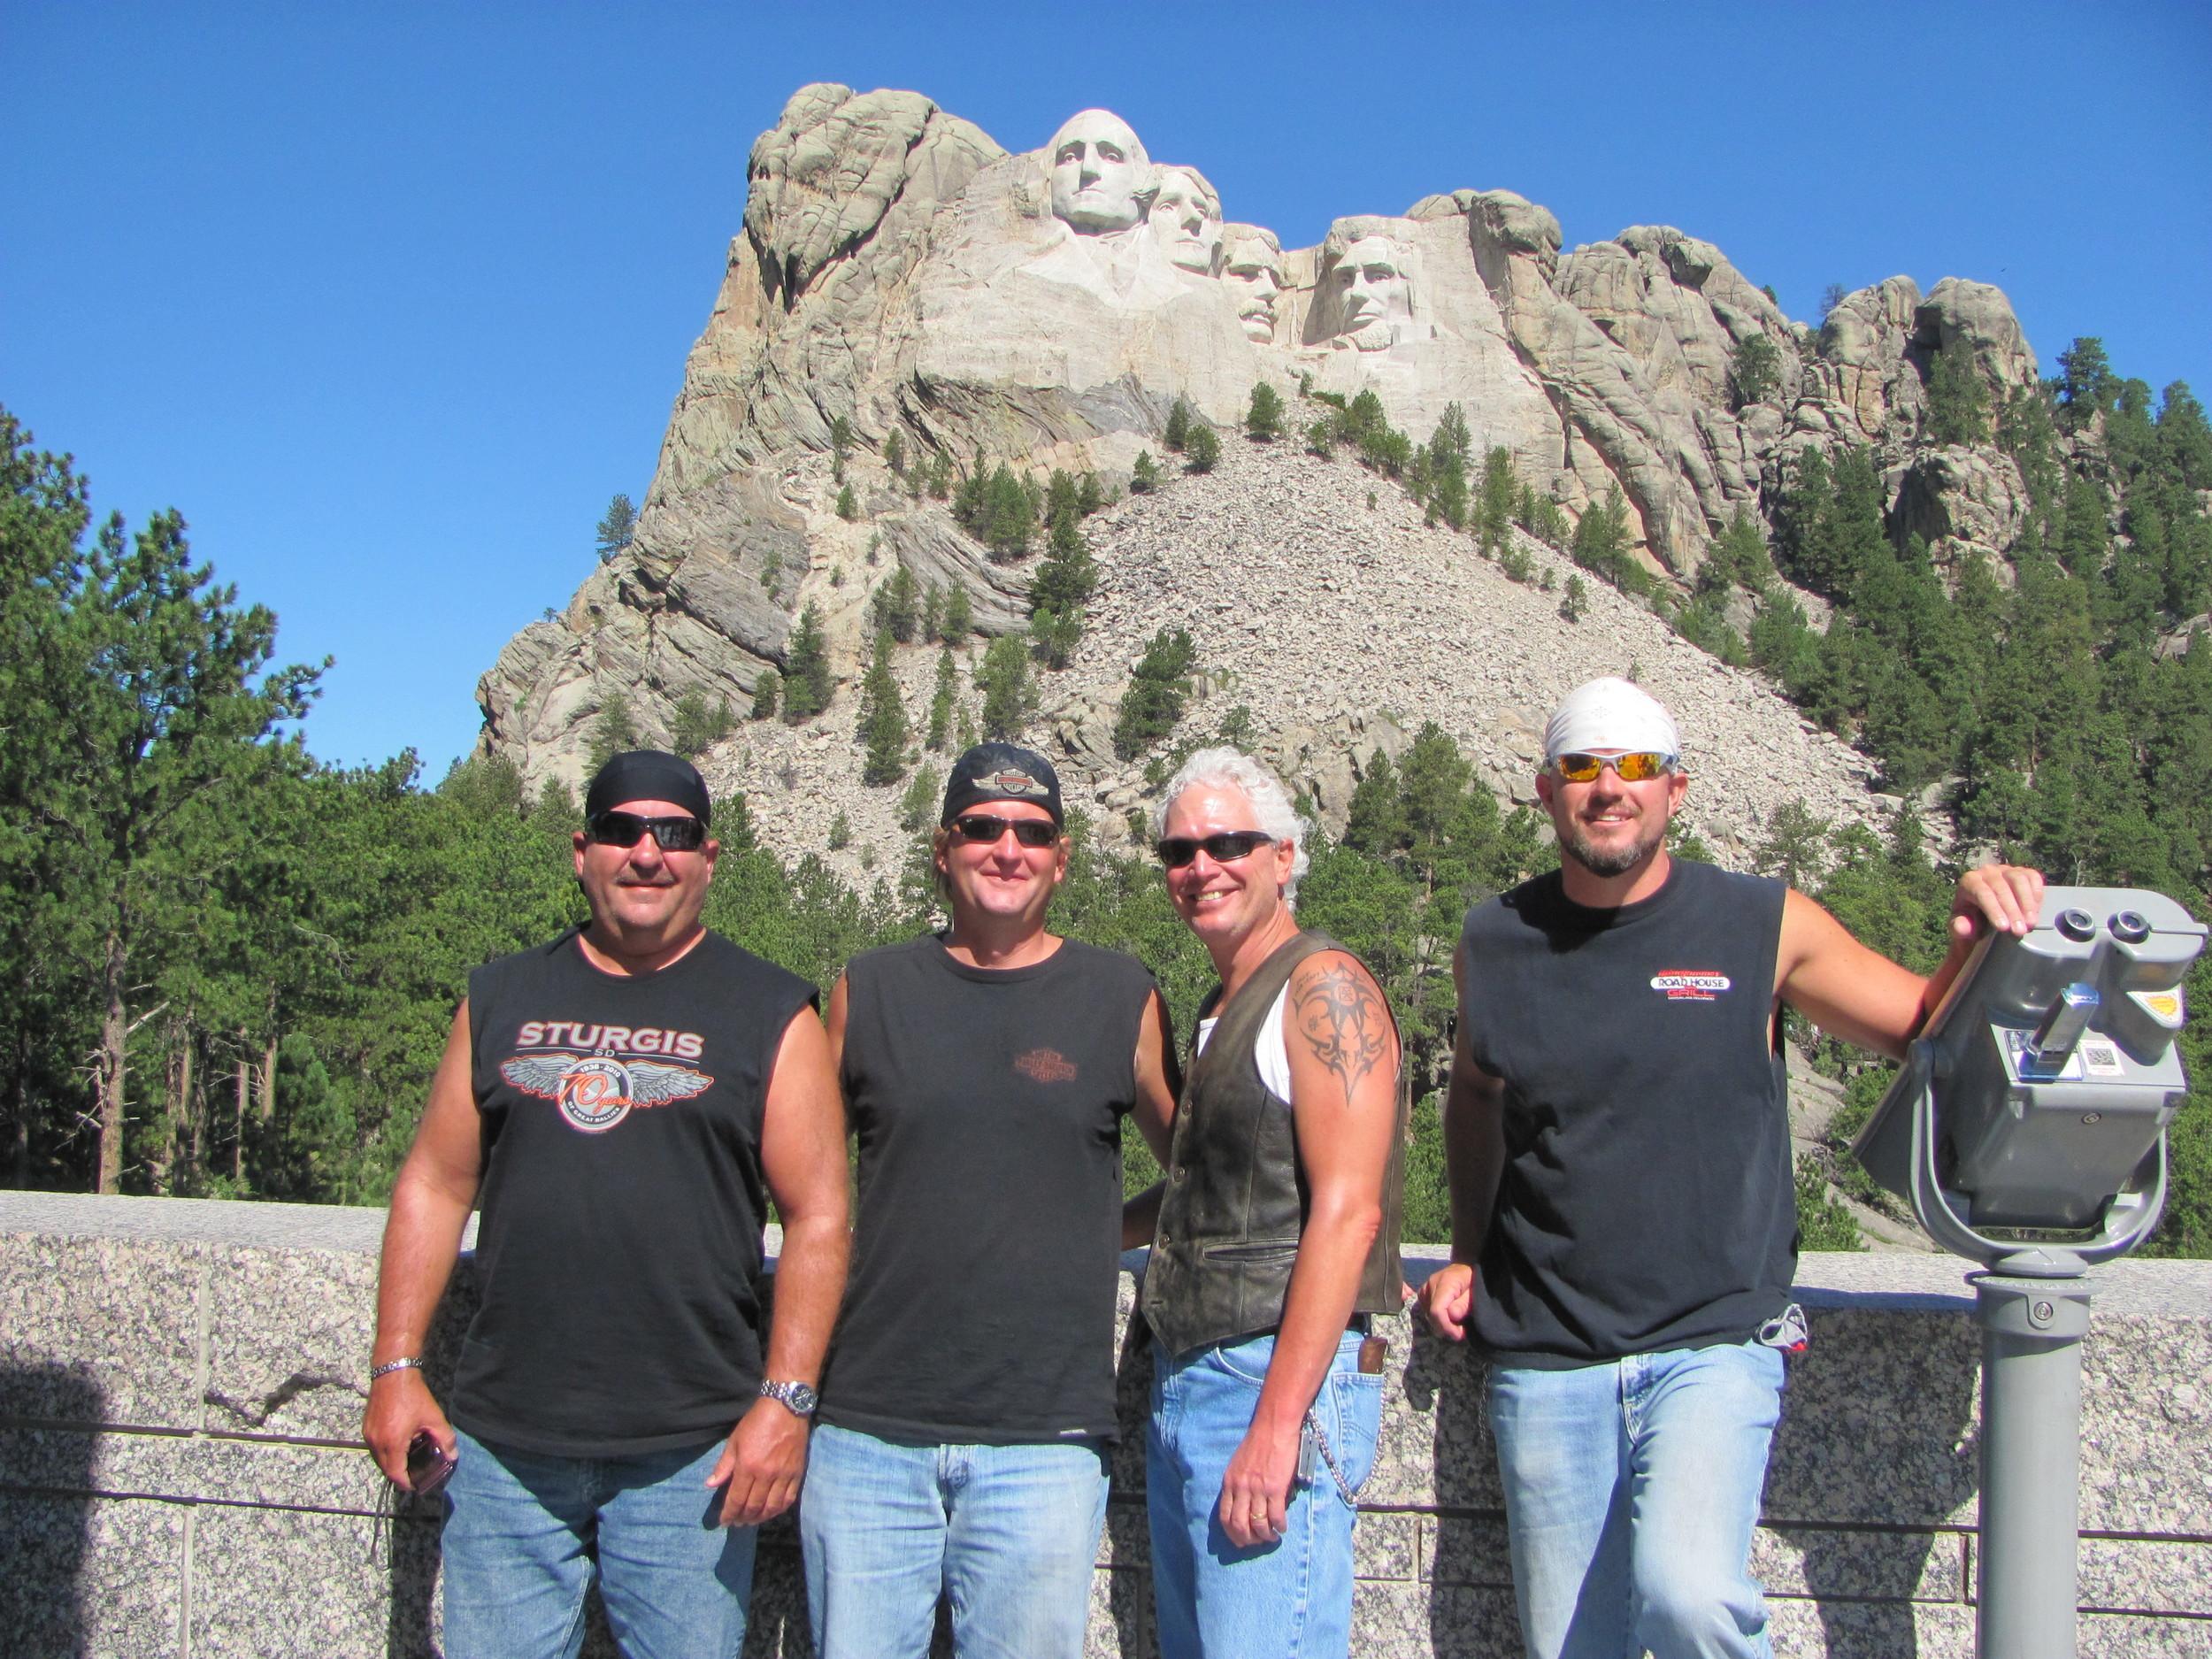 Riding to Mount Rushmore